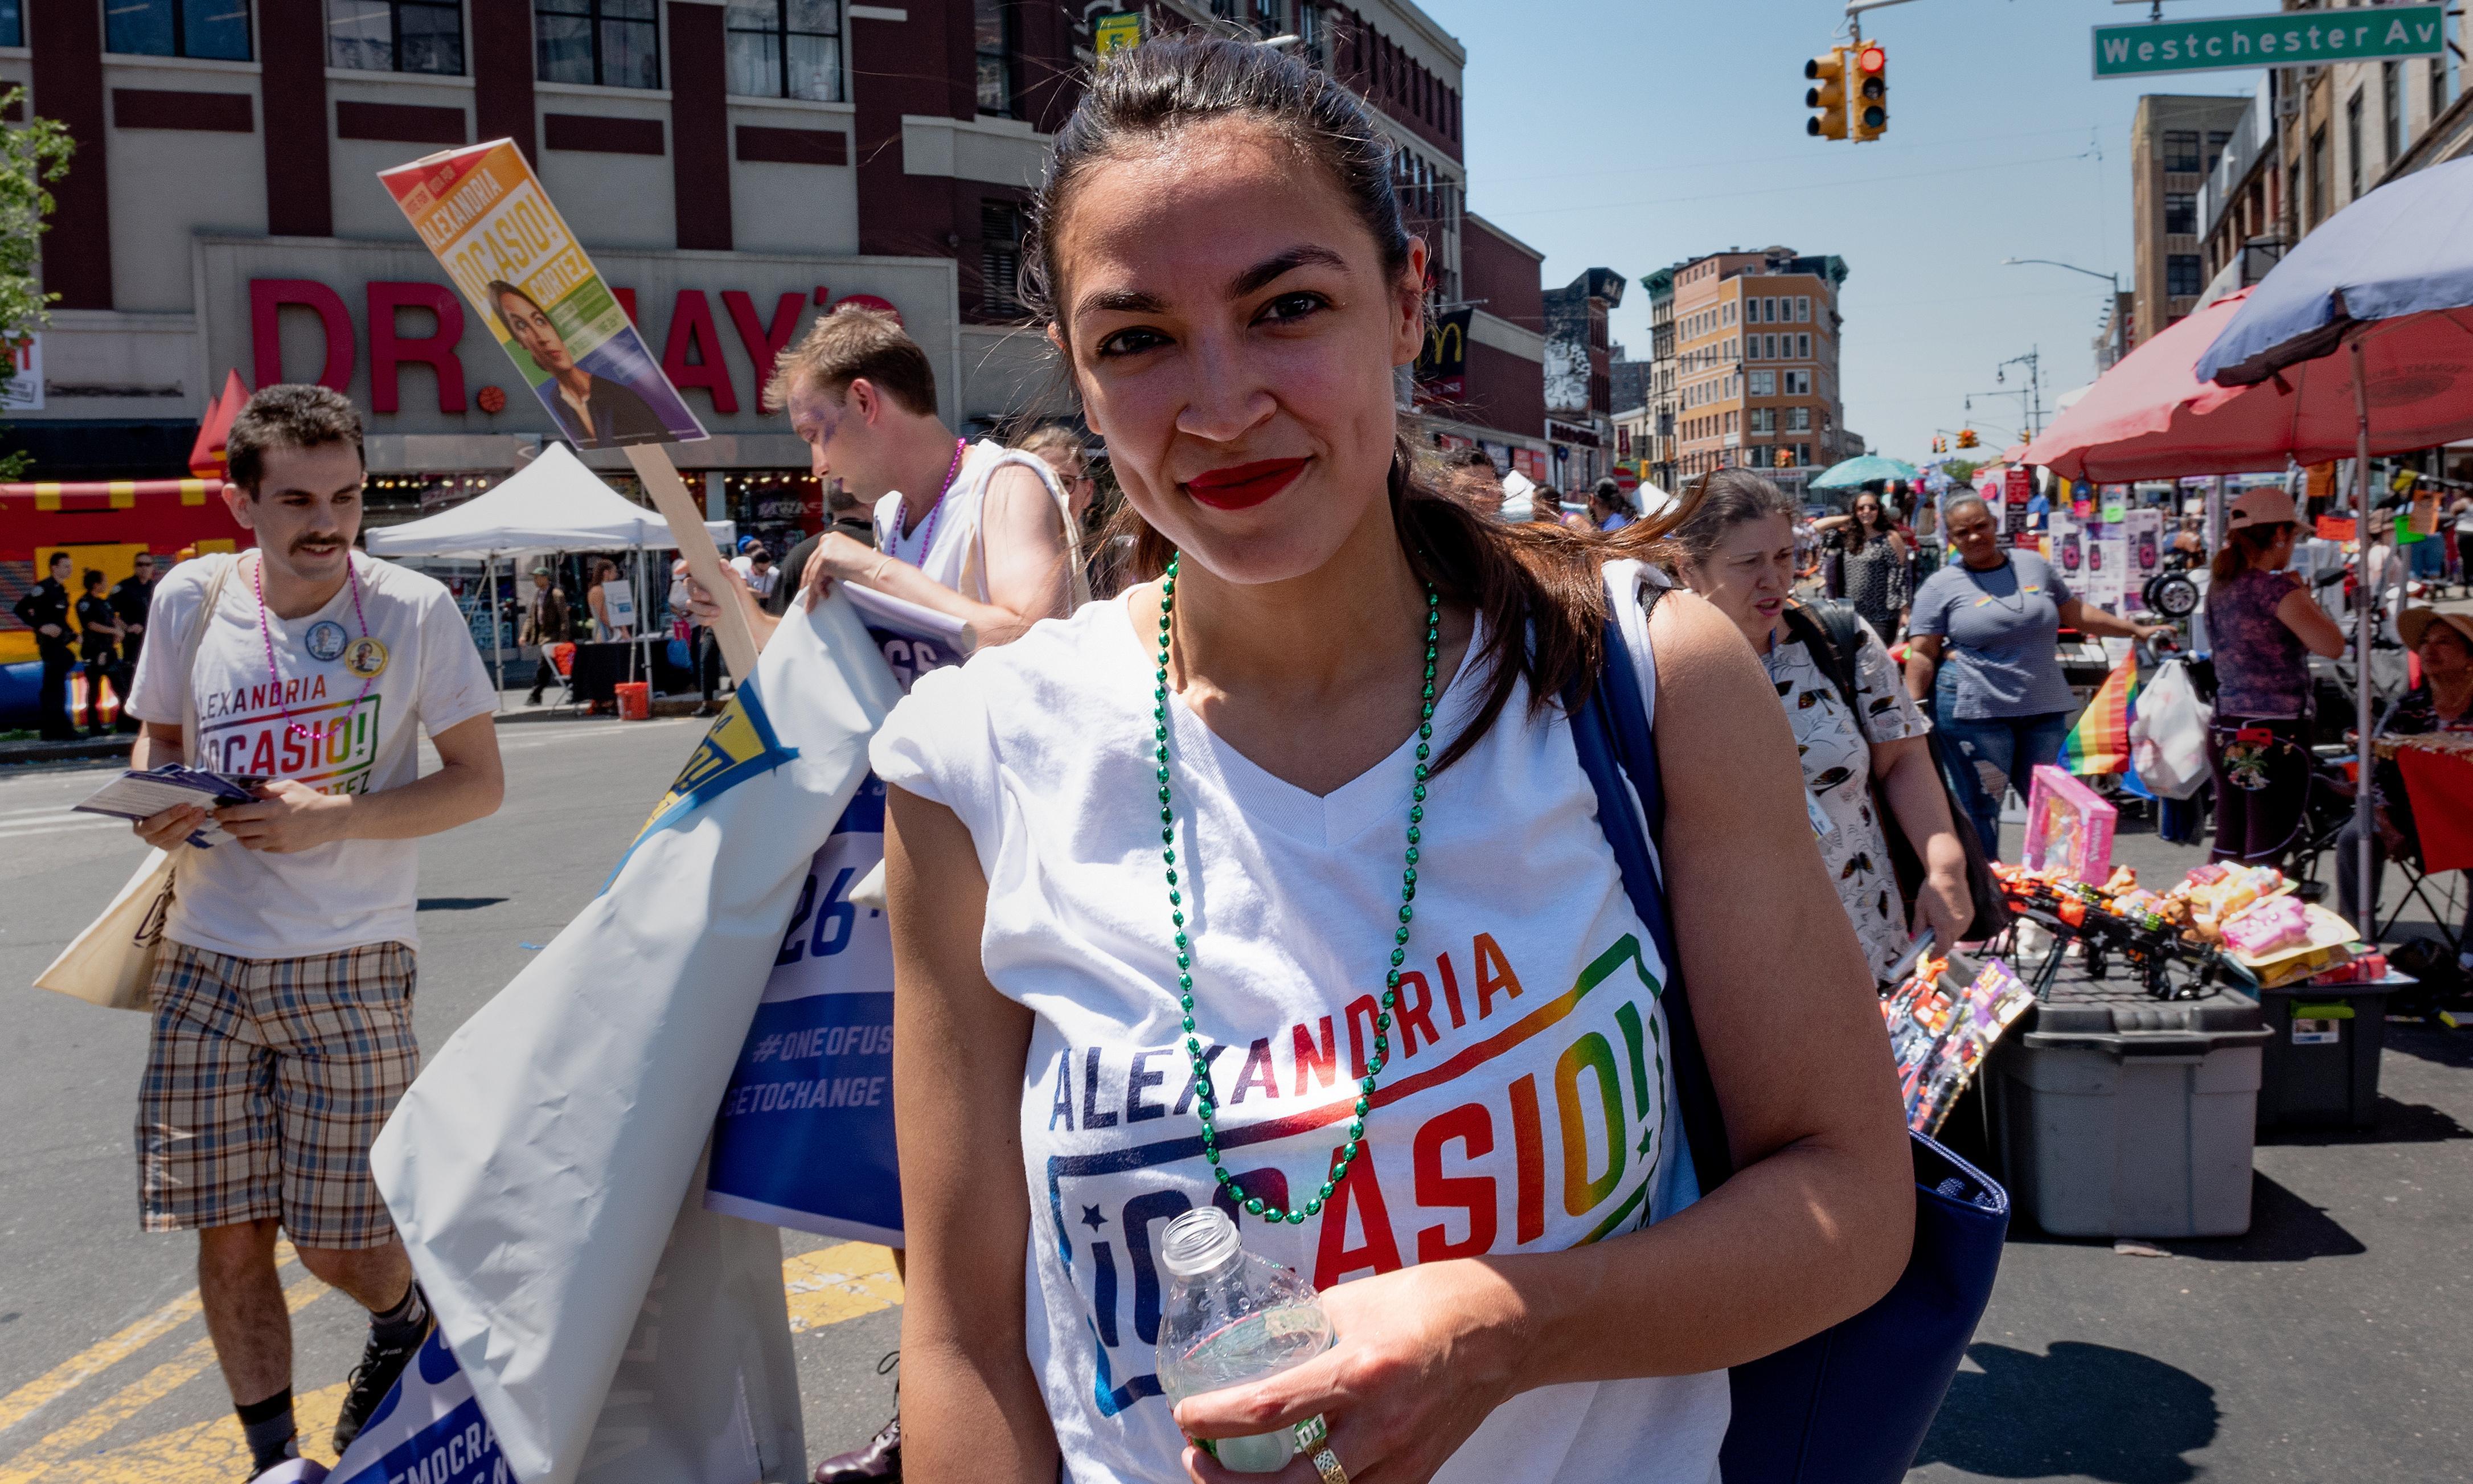 Four restaurants in the Bronx feel the Alexandria Ocasio-Cortez effect